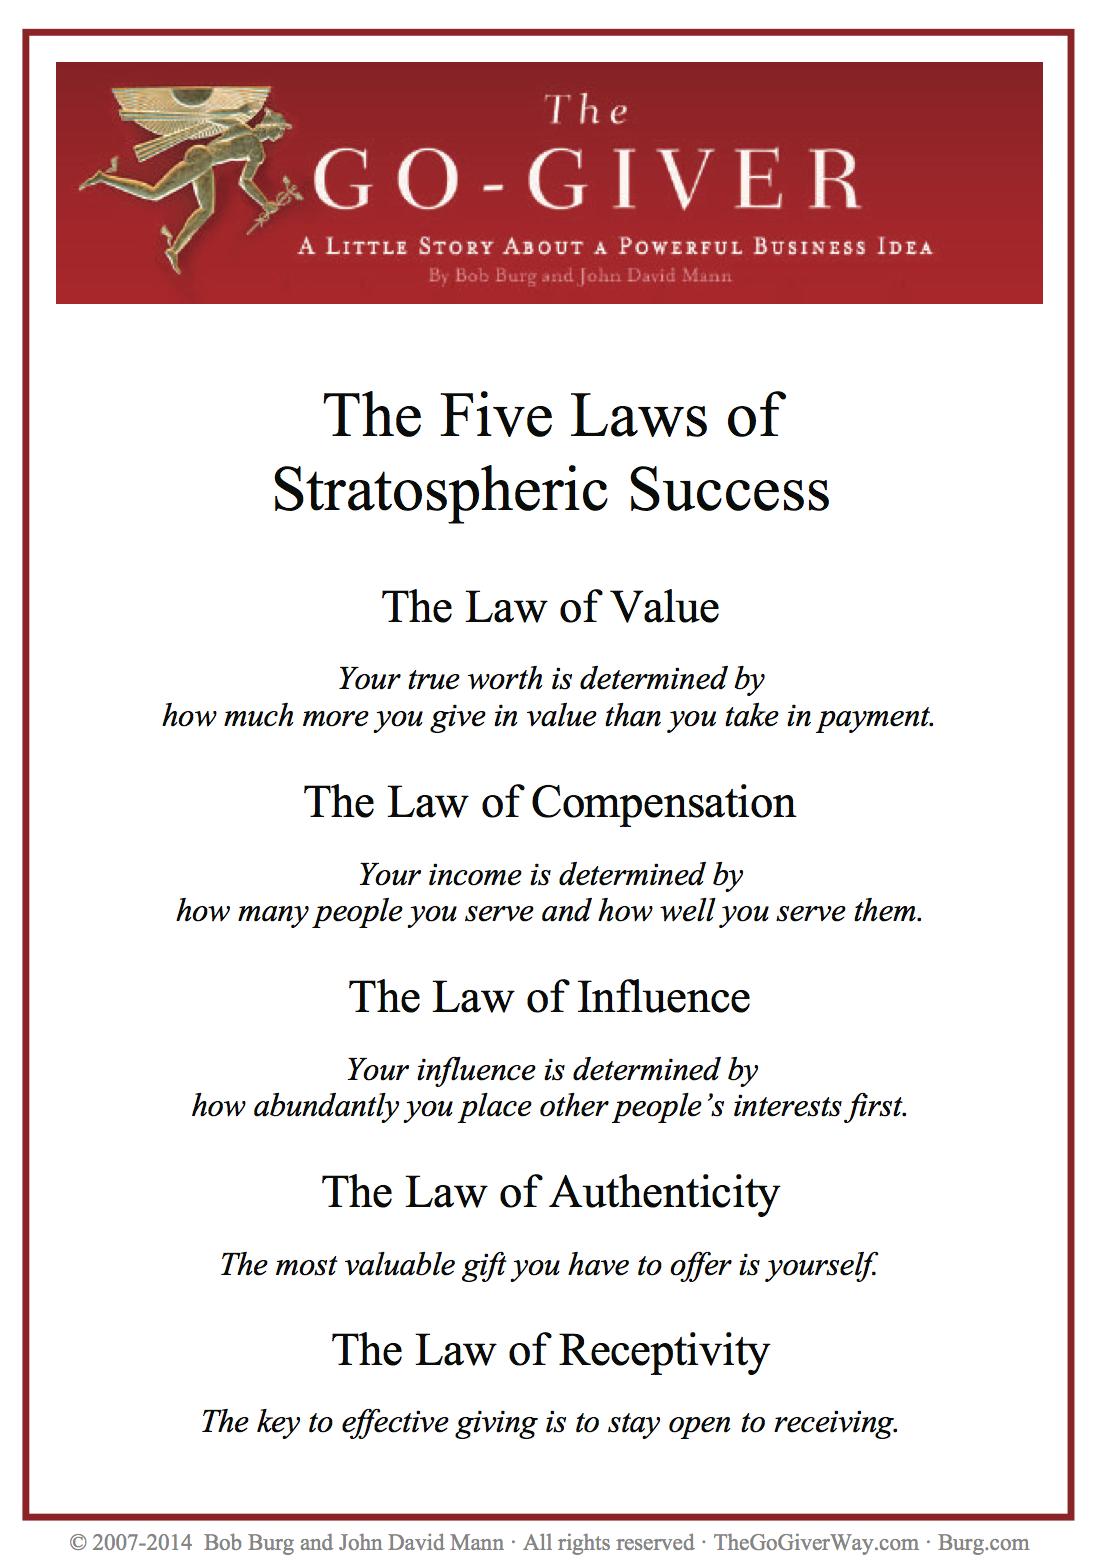 Workbooks success principles workbook : 5 laws of stratospheric success http://www.lawrencetam.net/lt-8 ...